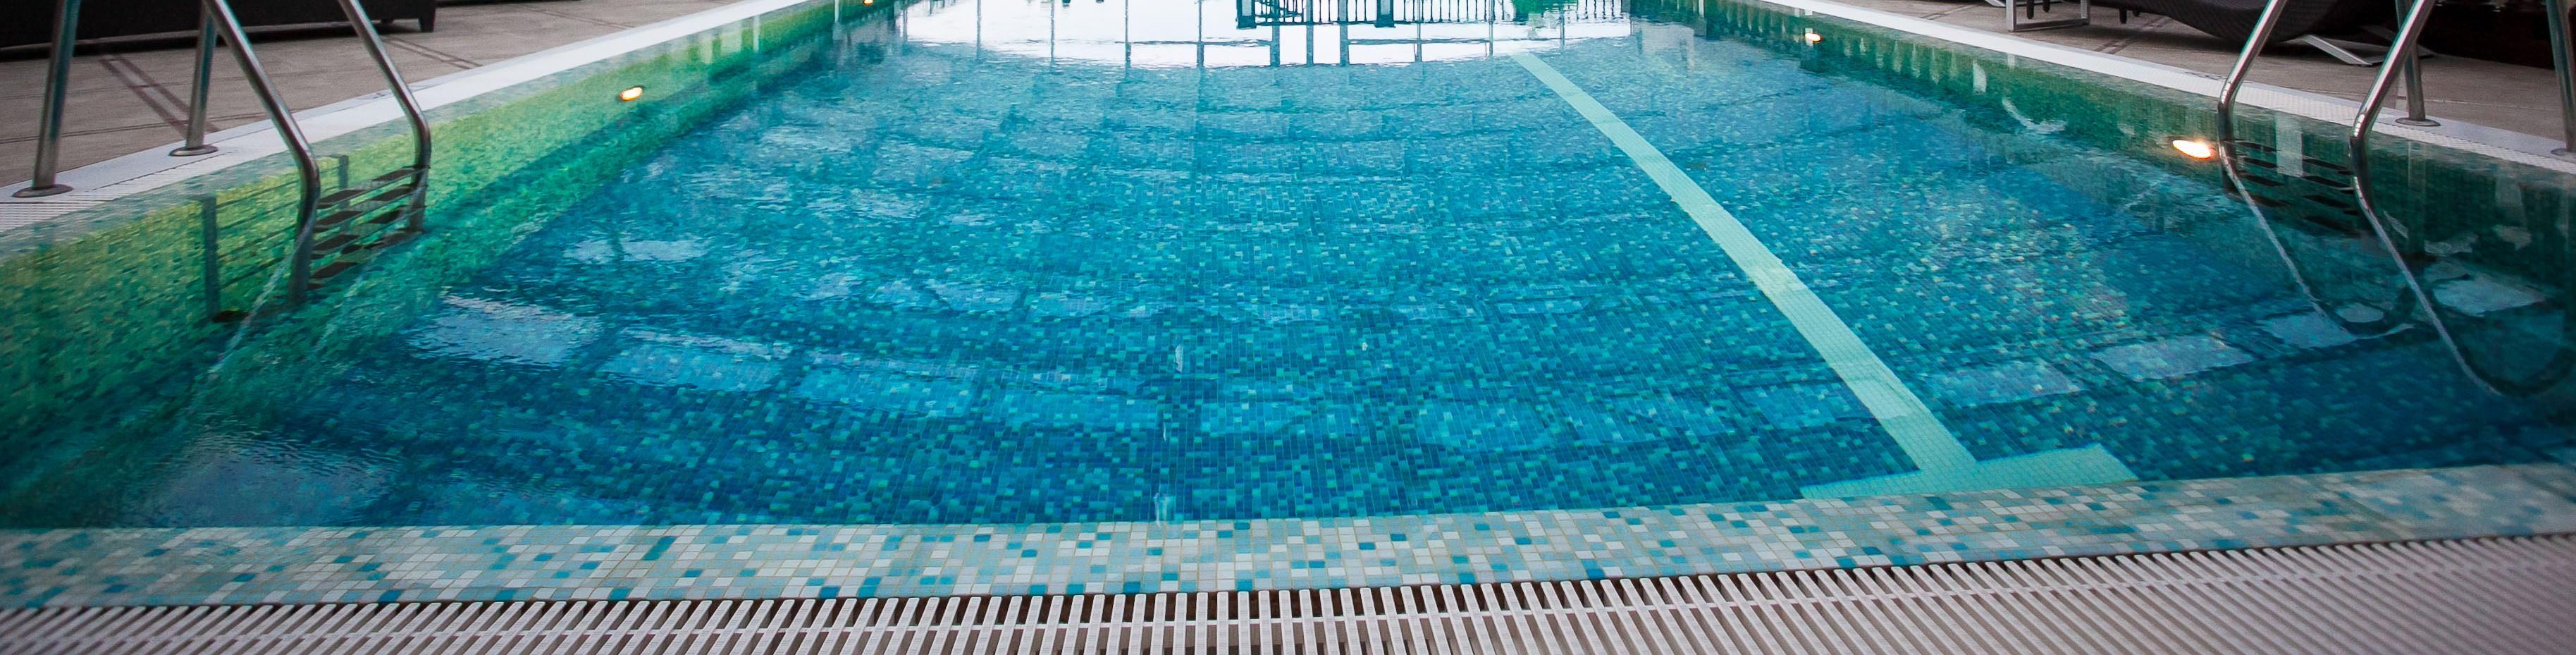 swimming pool orangery